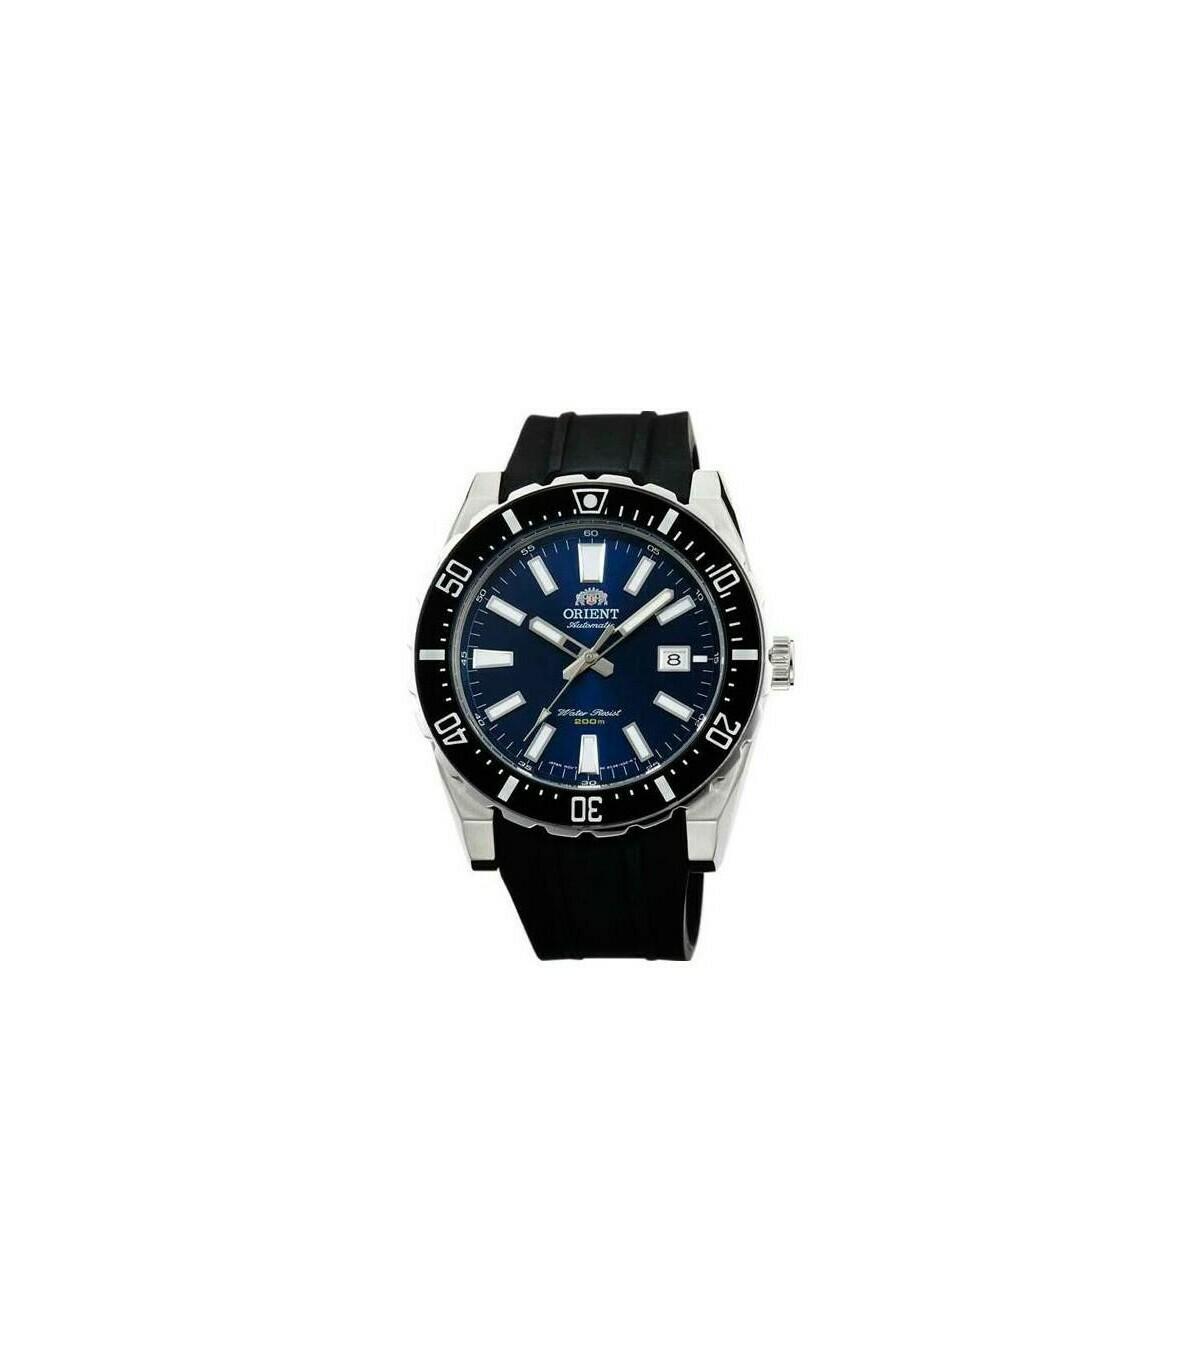 Reloj hombre automático Orient DIVERS FAC09004D correa goma 200m